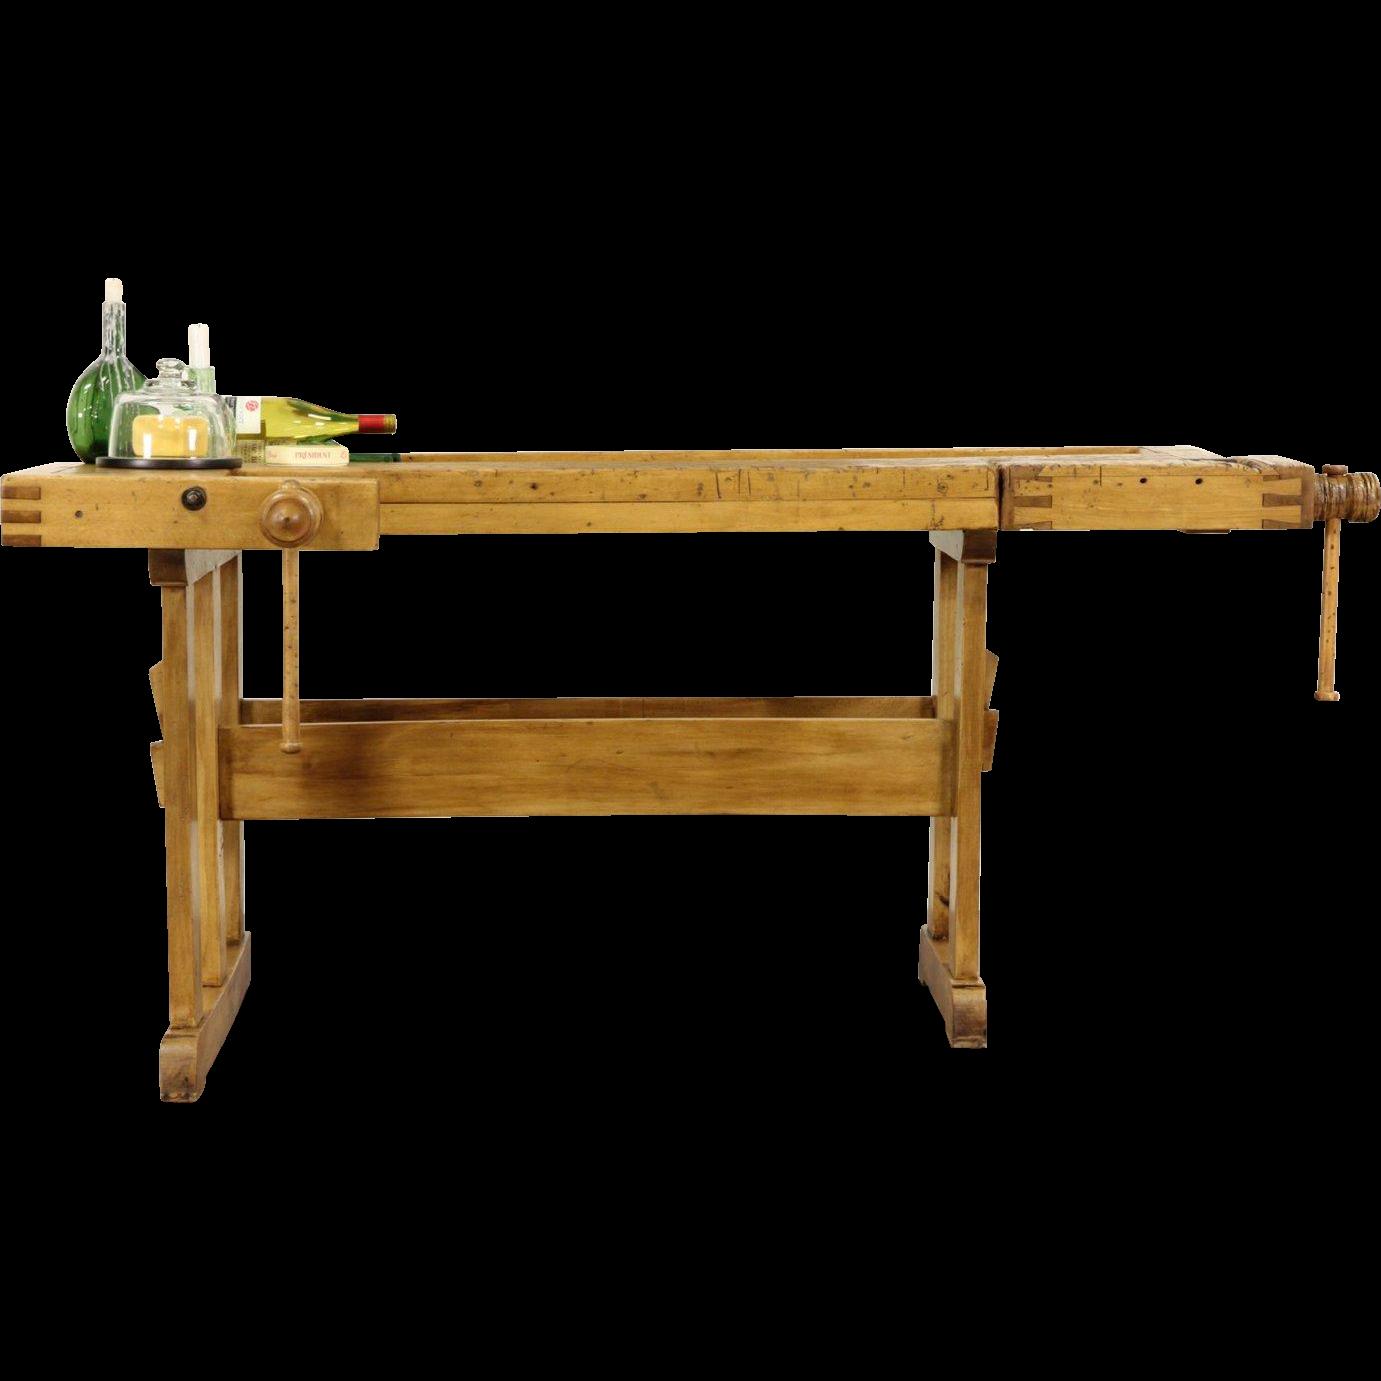 Carpenter 1890 Antique Workbench, Kitchen Island or Wine & Cheese Table